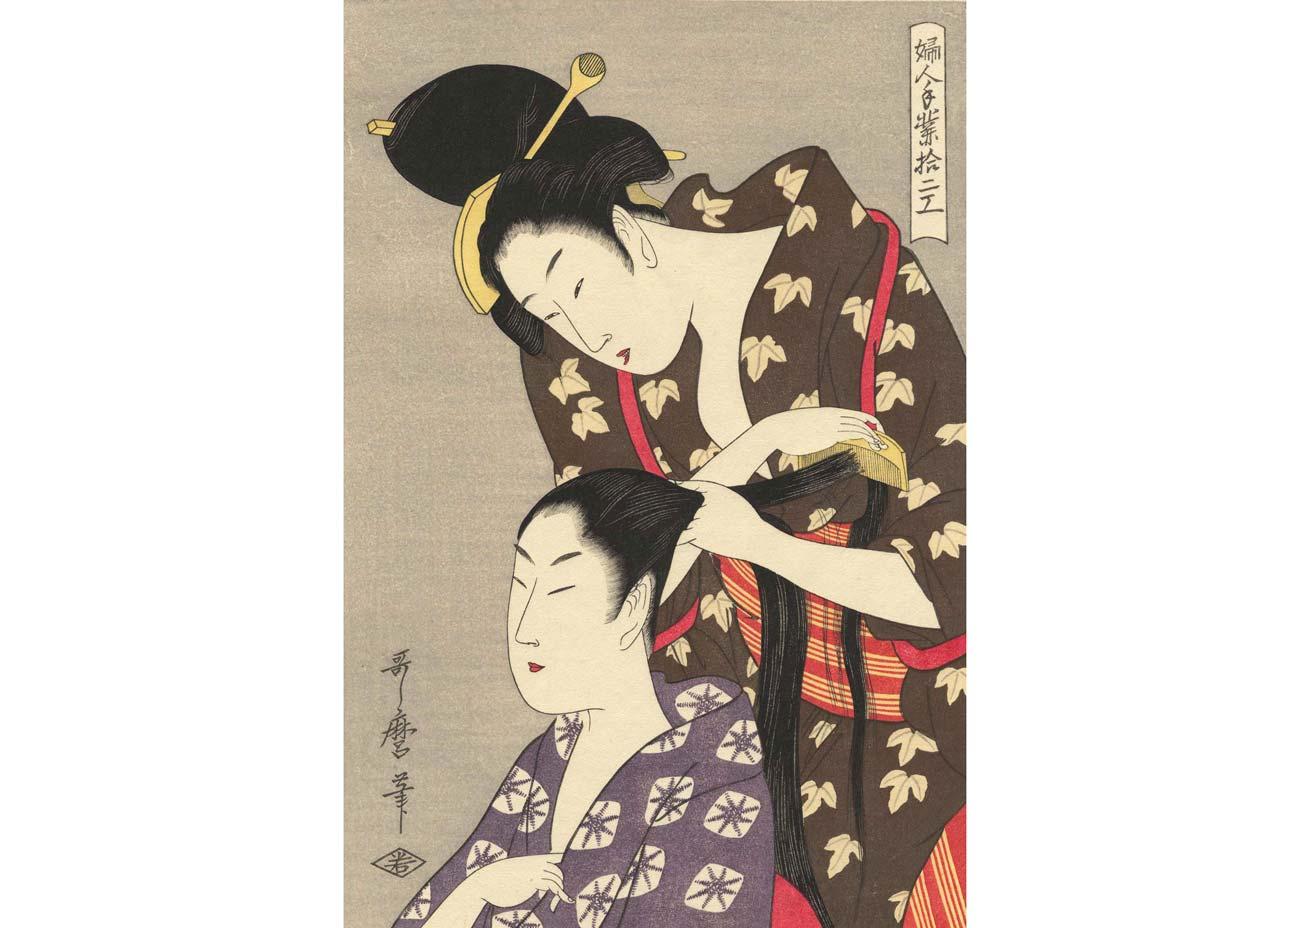 Hairdressing, Woodblock Print by Kitagawa Utamaro